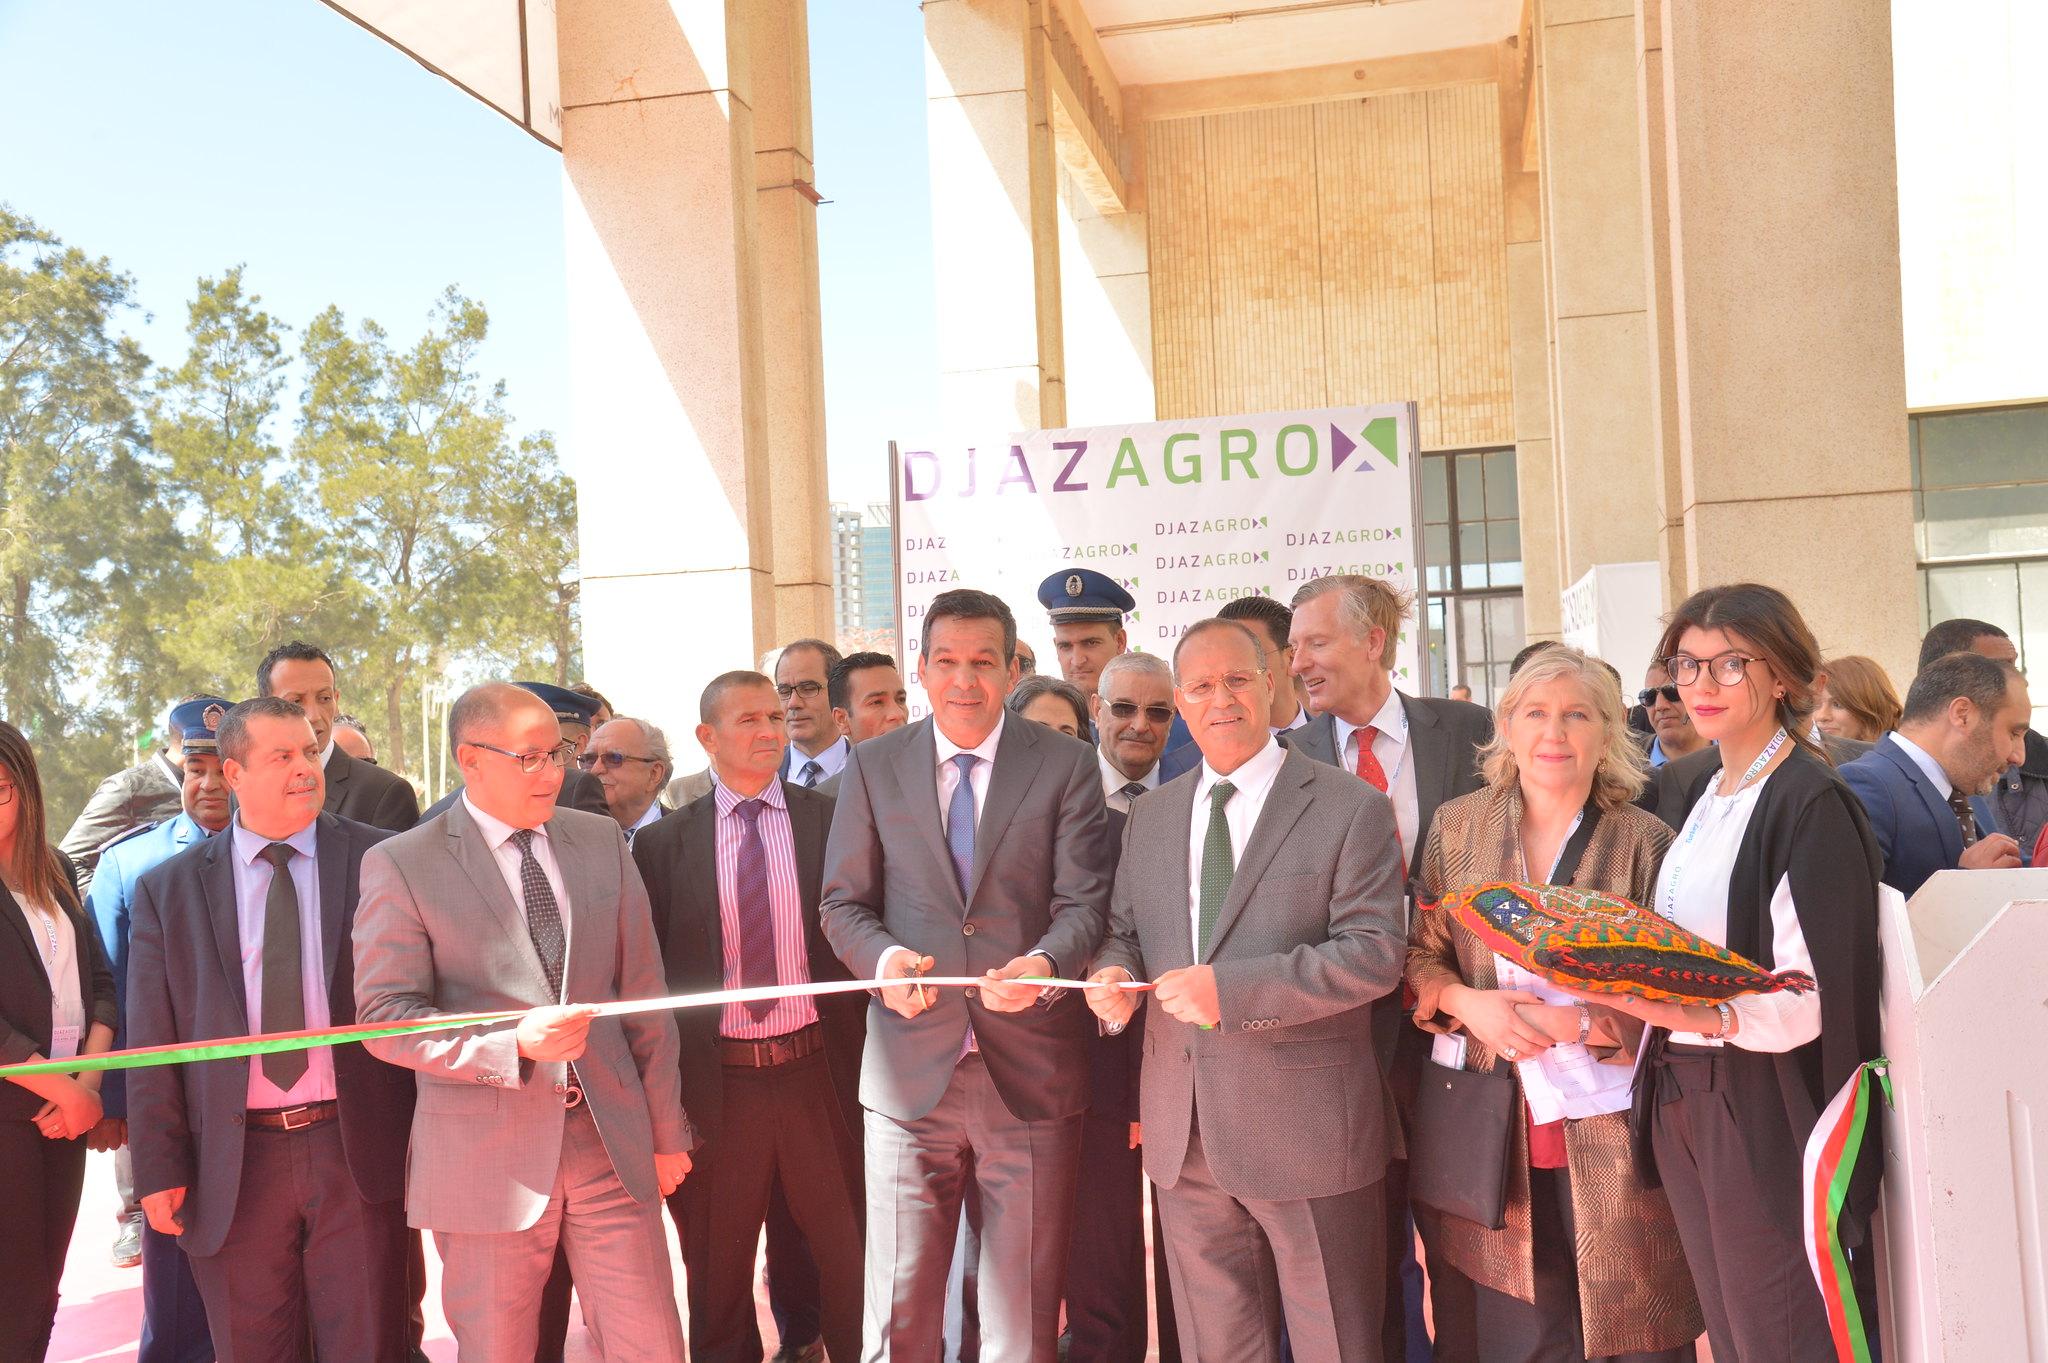 DJAZAGRO 2018 - Visites officielles des Ministres